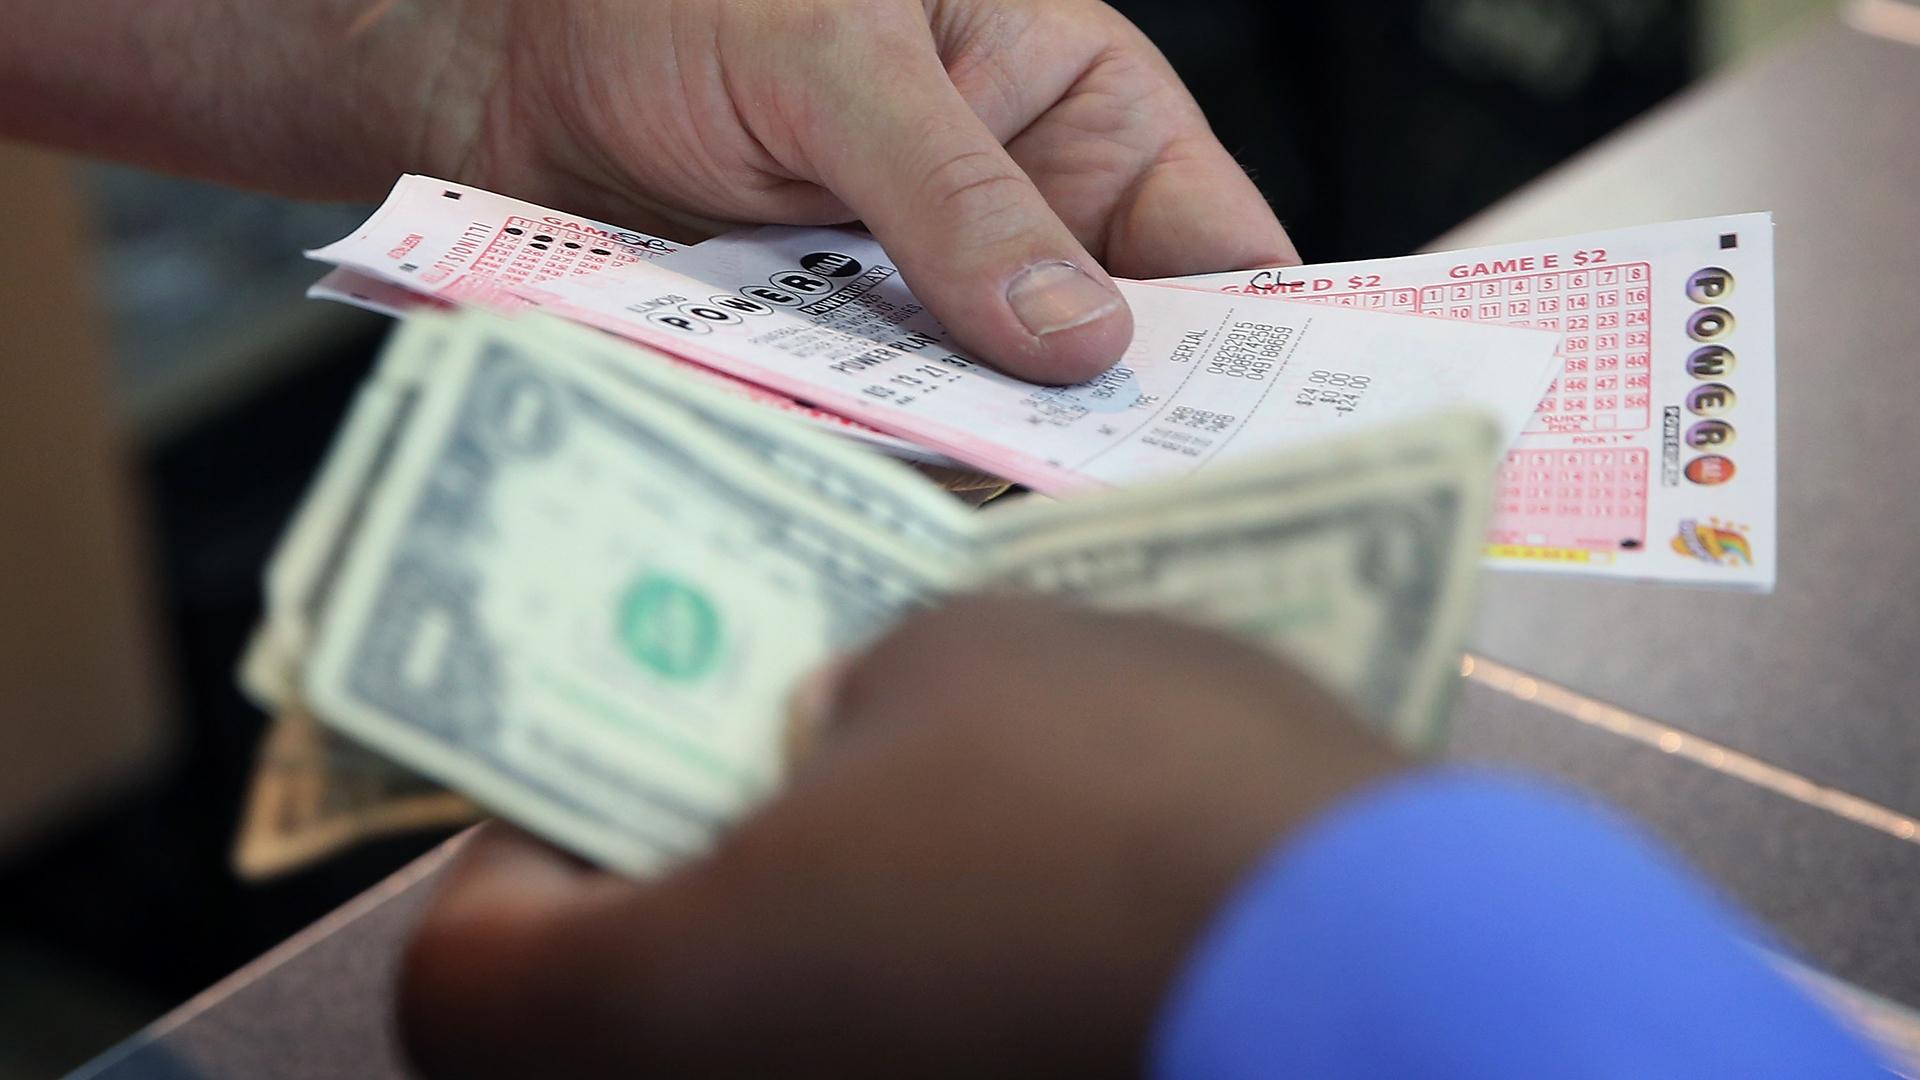 Buying a Powerball ticket-159532.jpg36757301